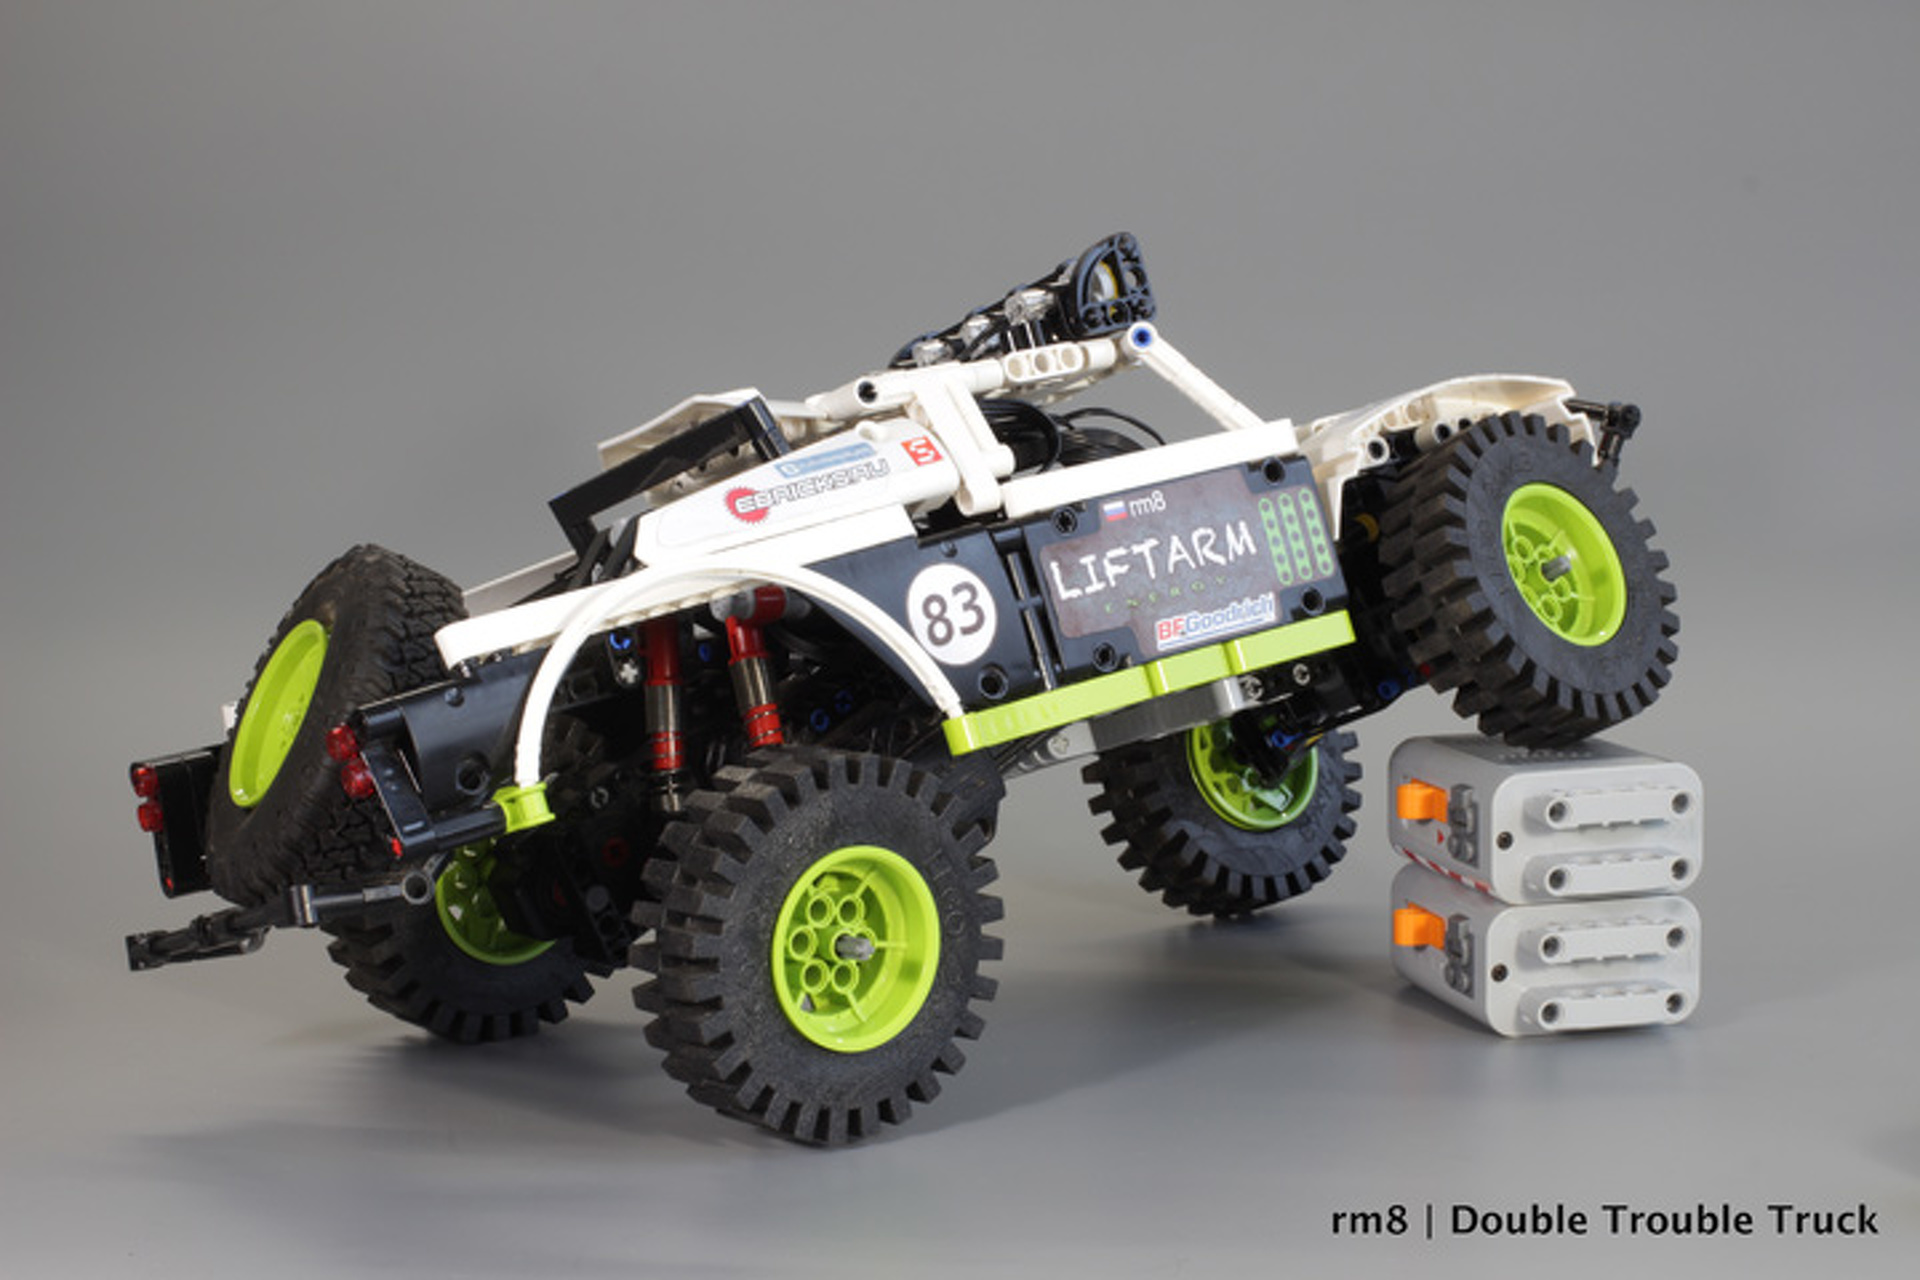 Ken Block Hd Wallpaper Custom Lego Car Www Pixshark Com Images Galleries With